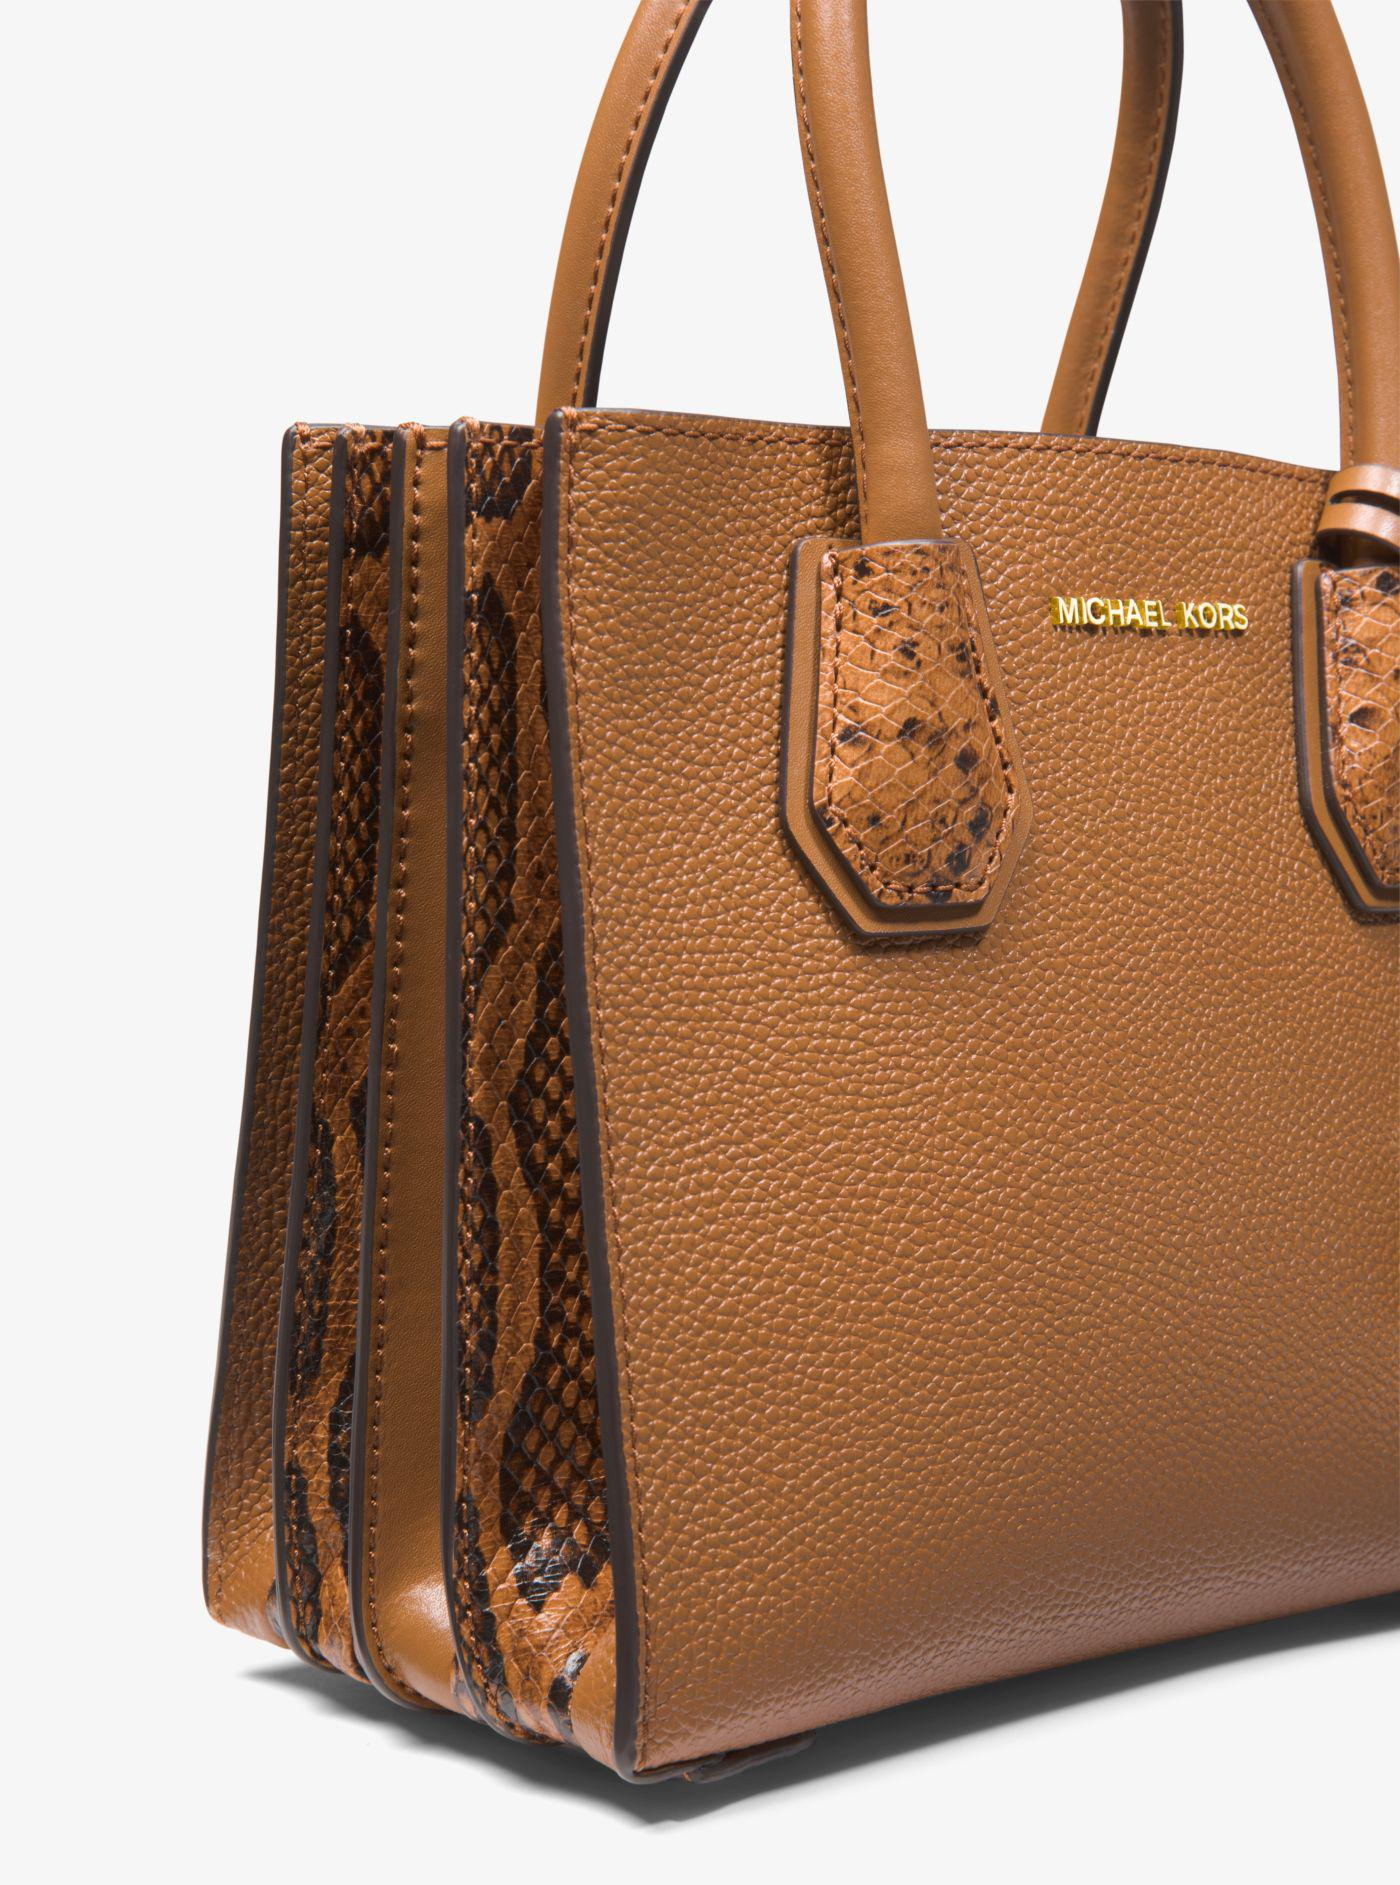 ca5c6966f66589 Michael Kors Mercer Medium Pebbled Leather Accordion Crossbody Bag ...